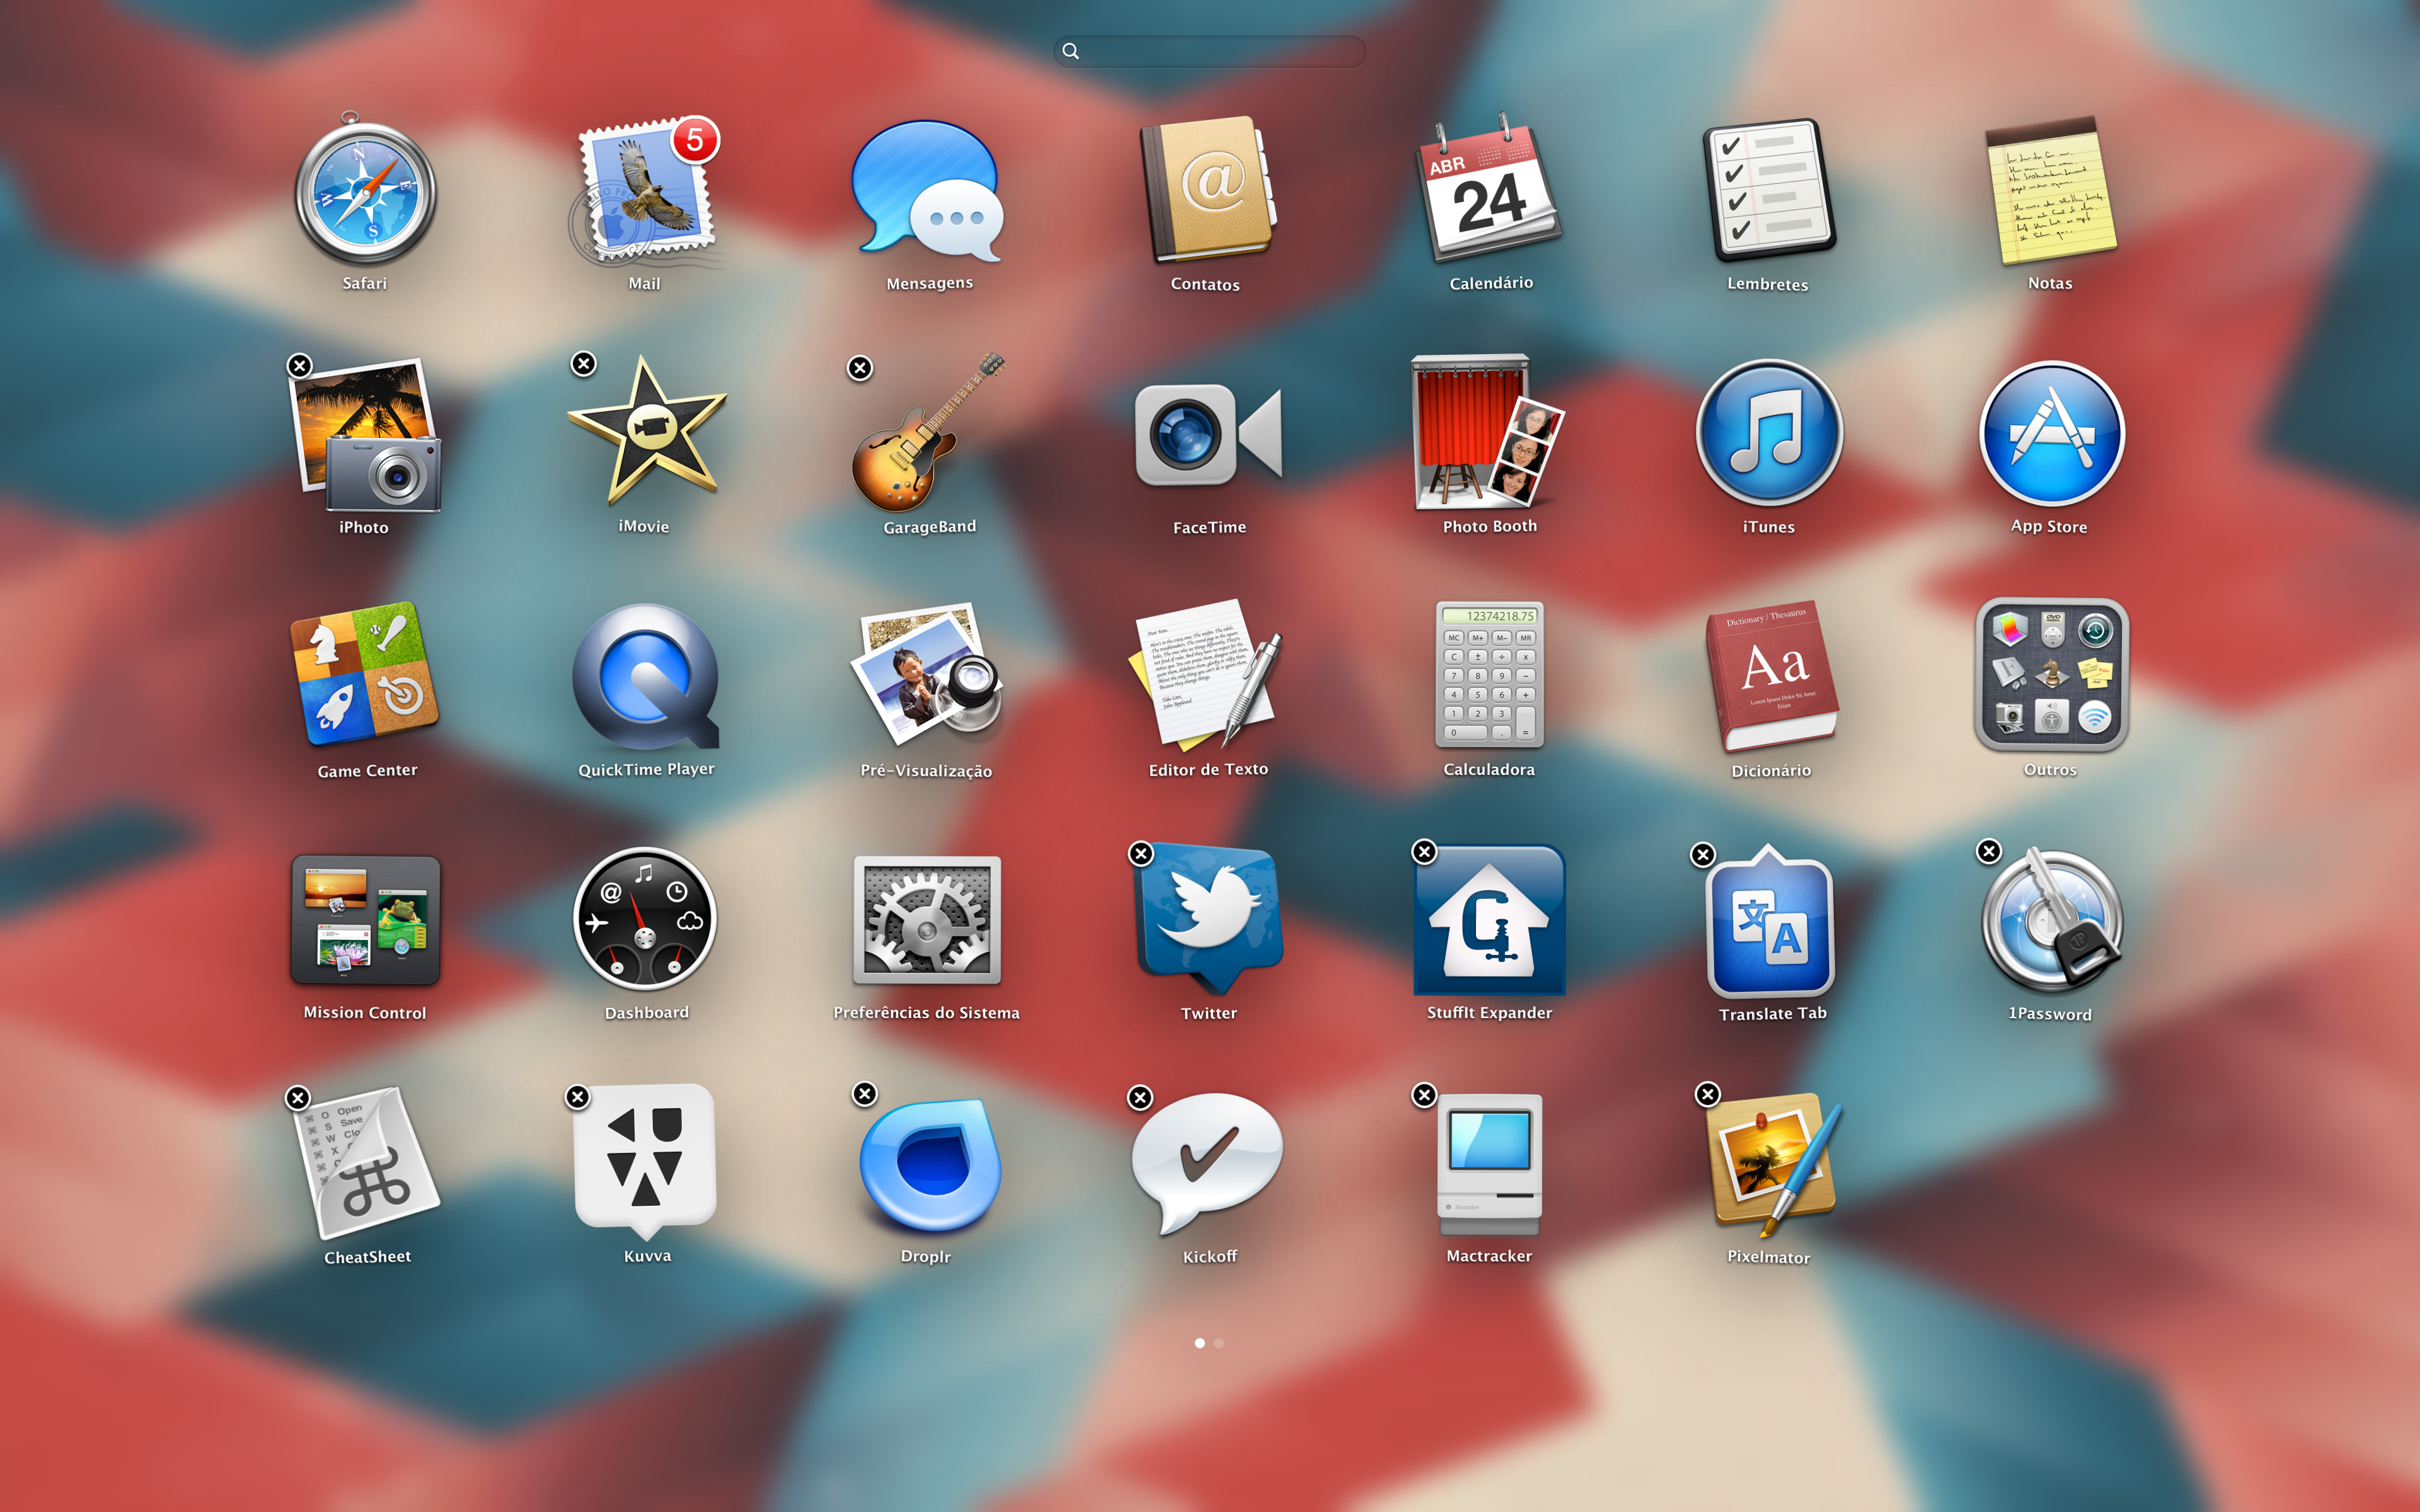 Apagando apps pelo Launchpad